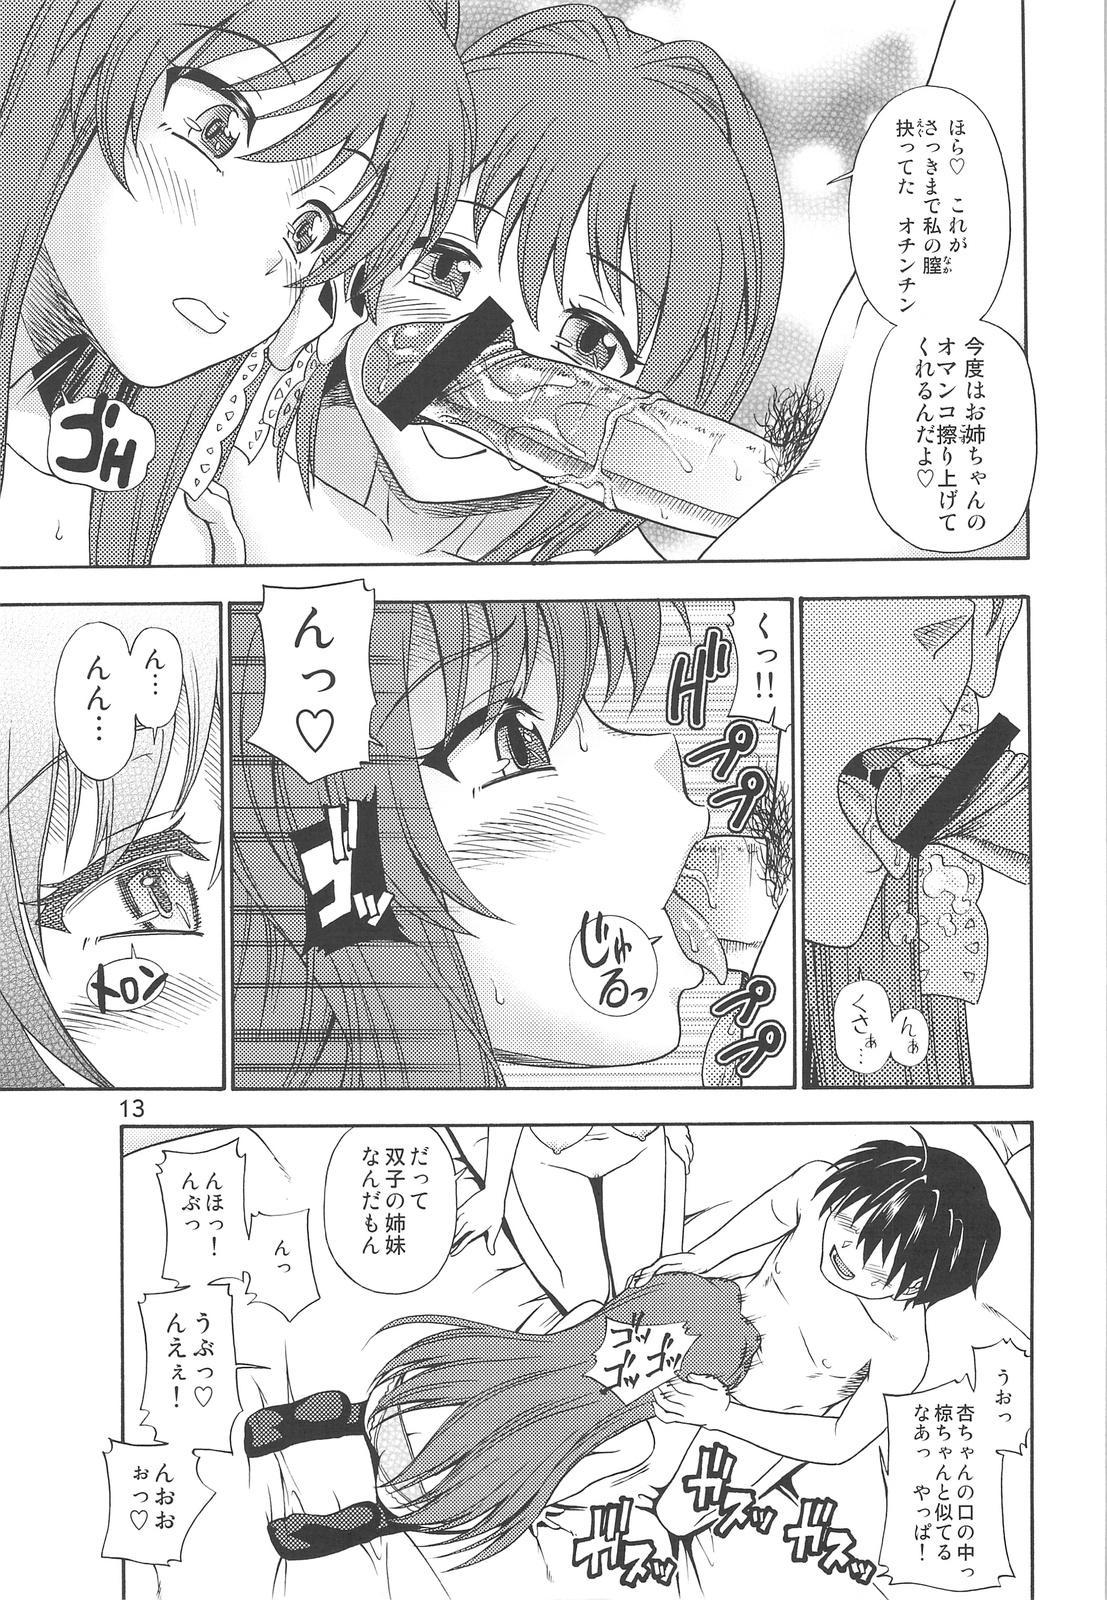 Fujibayashi Nado - Fujibayashi Twins After Story 11